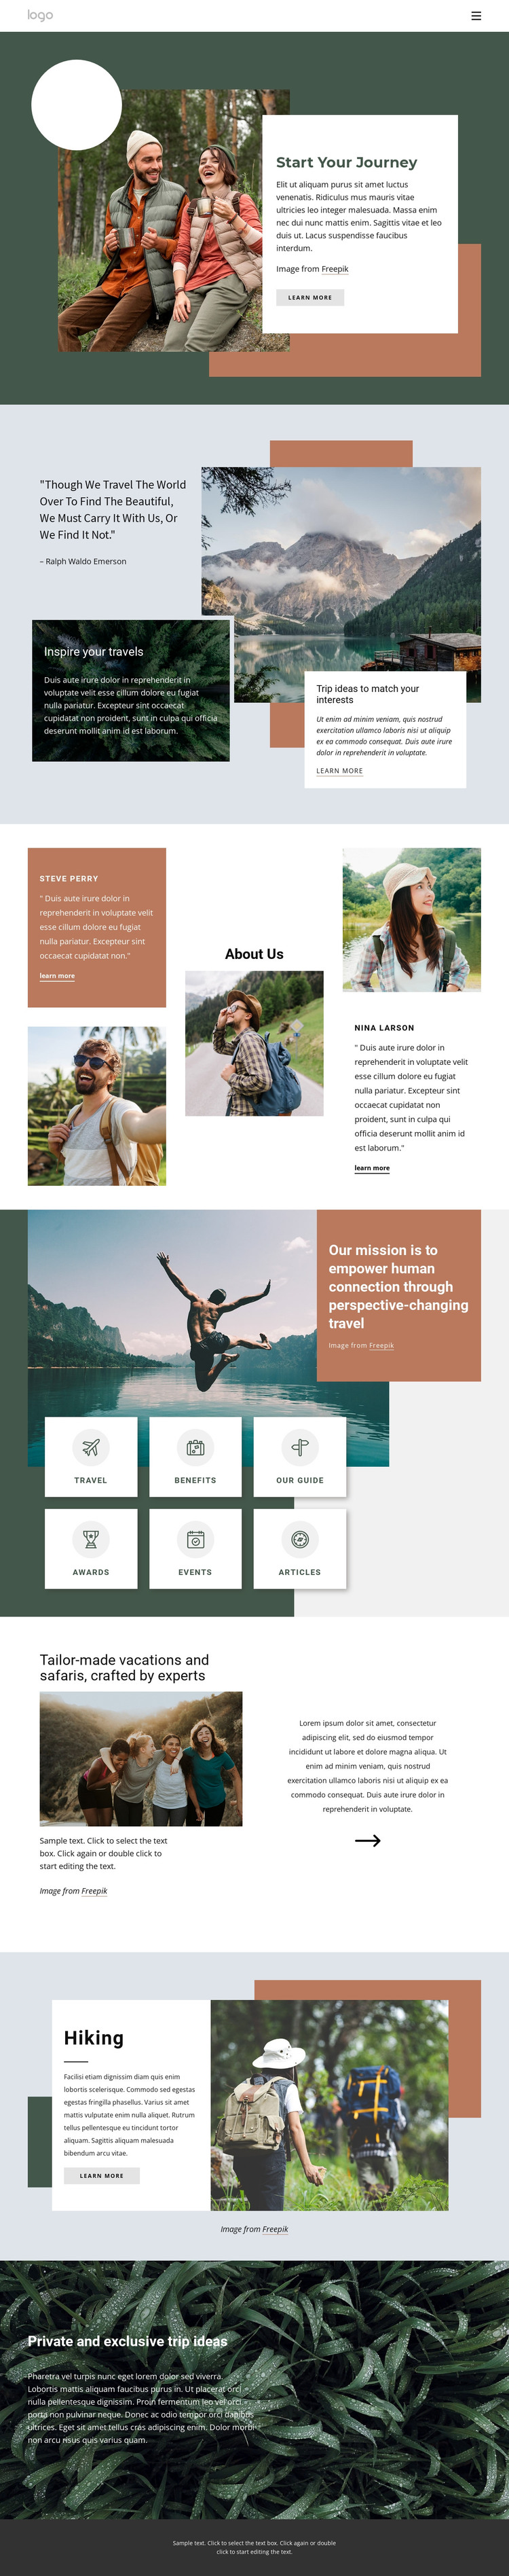 Adventure travel company Web Design